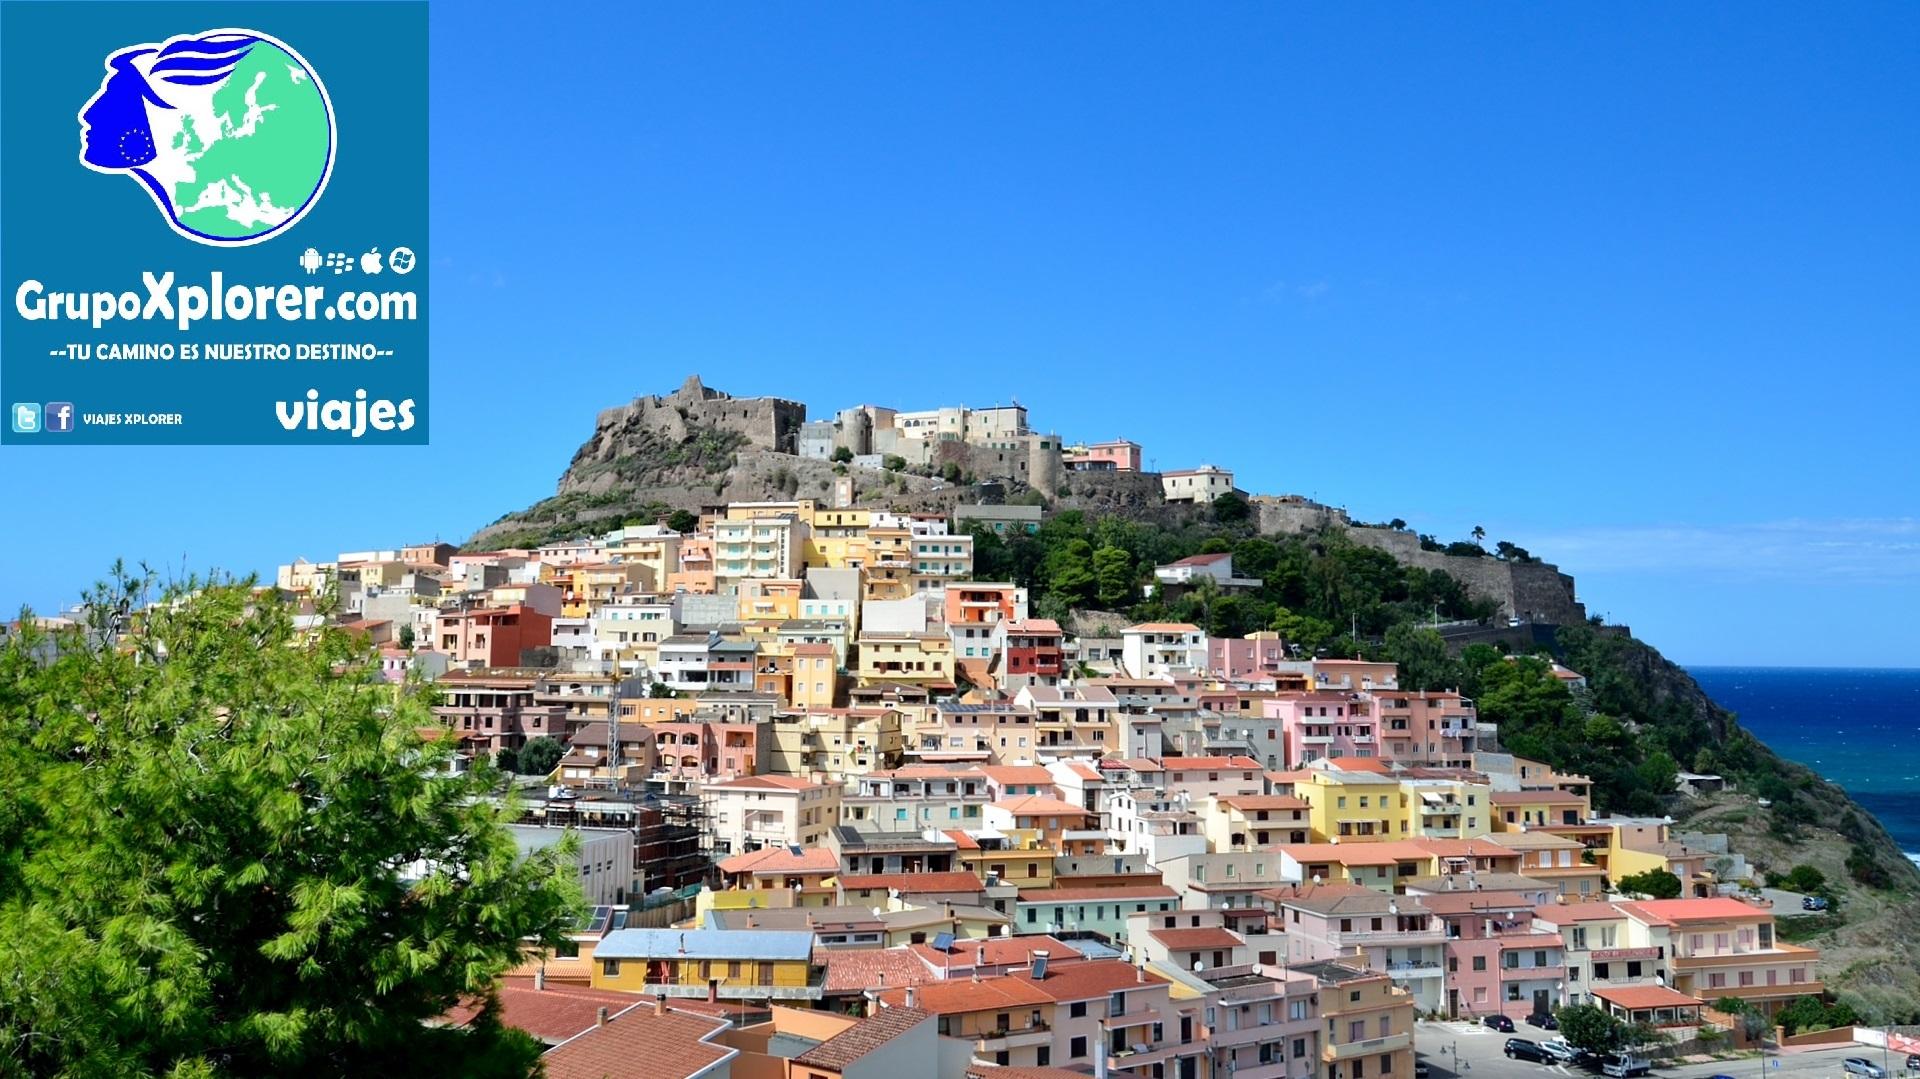 Castelsardo_-_Province_of_Sassari_-_Sardinia,_Italy_-_13_Sept._2012